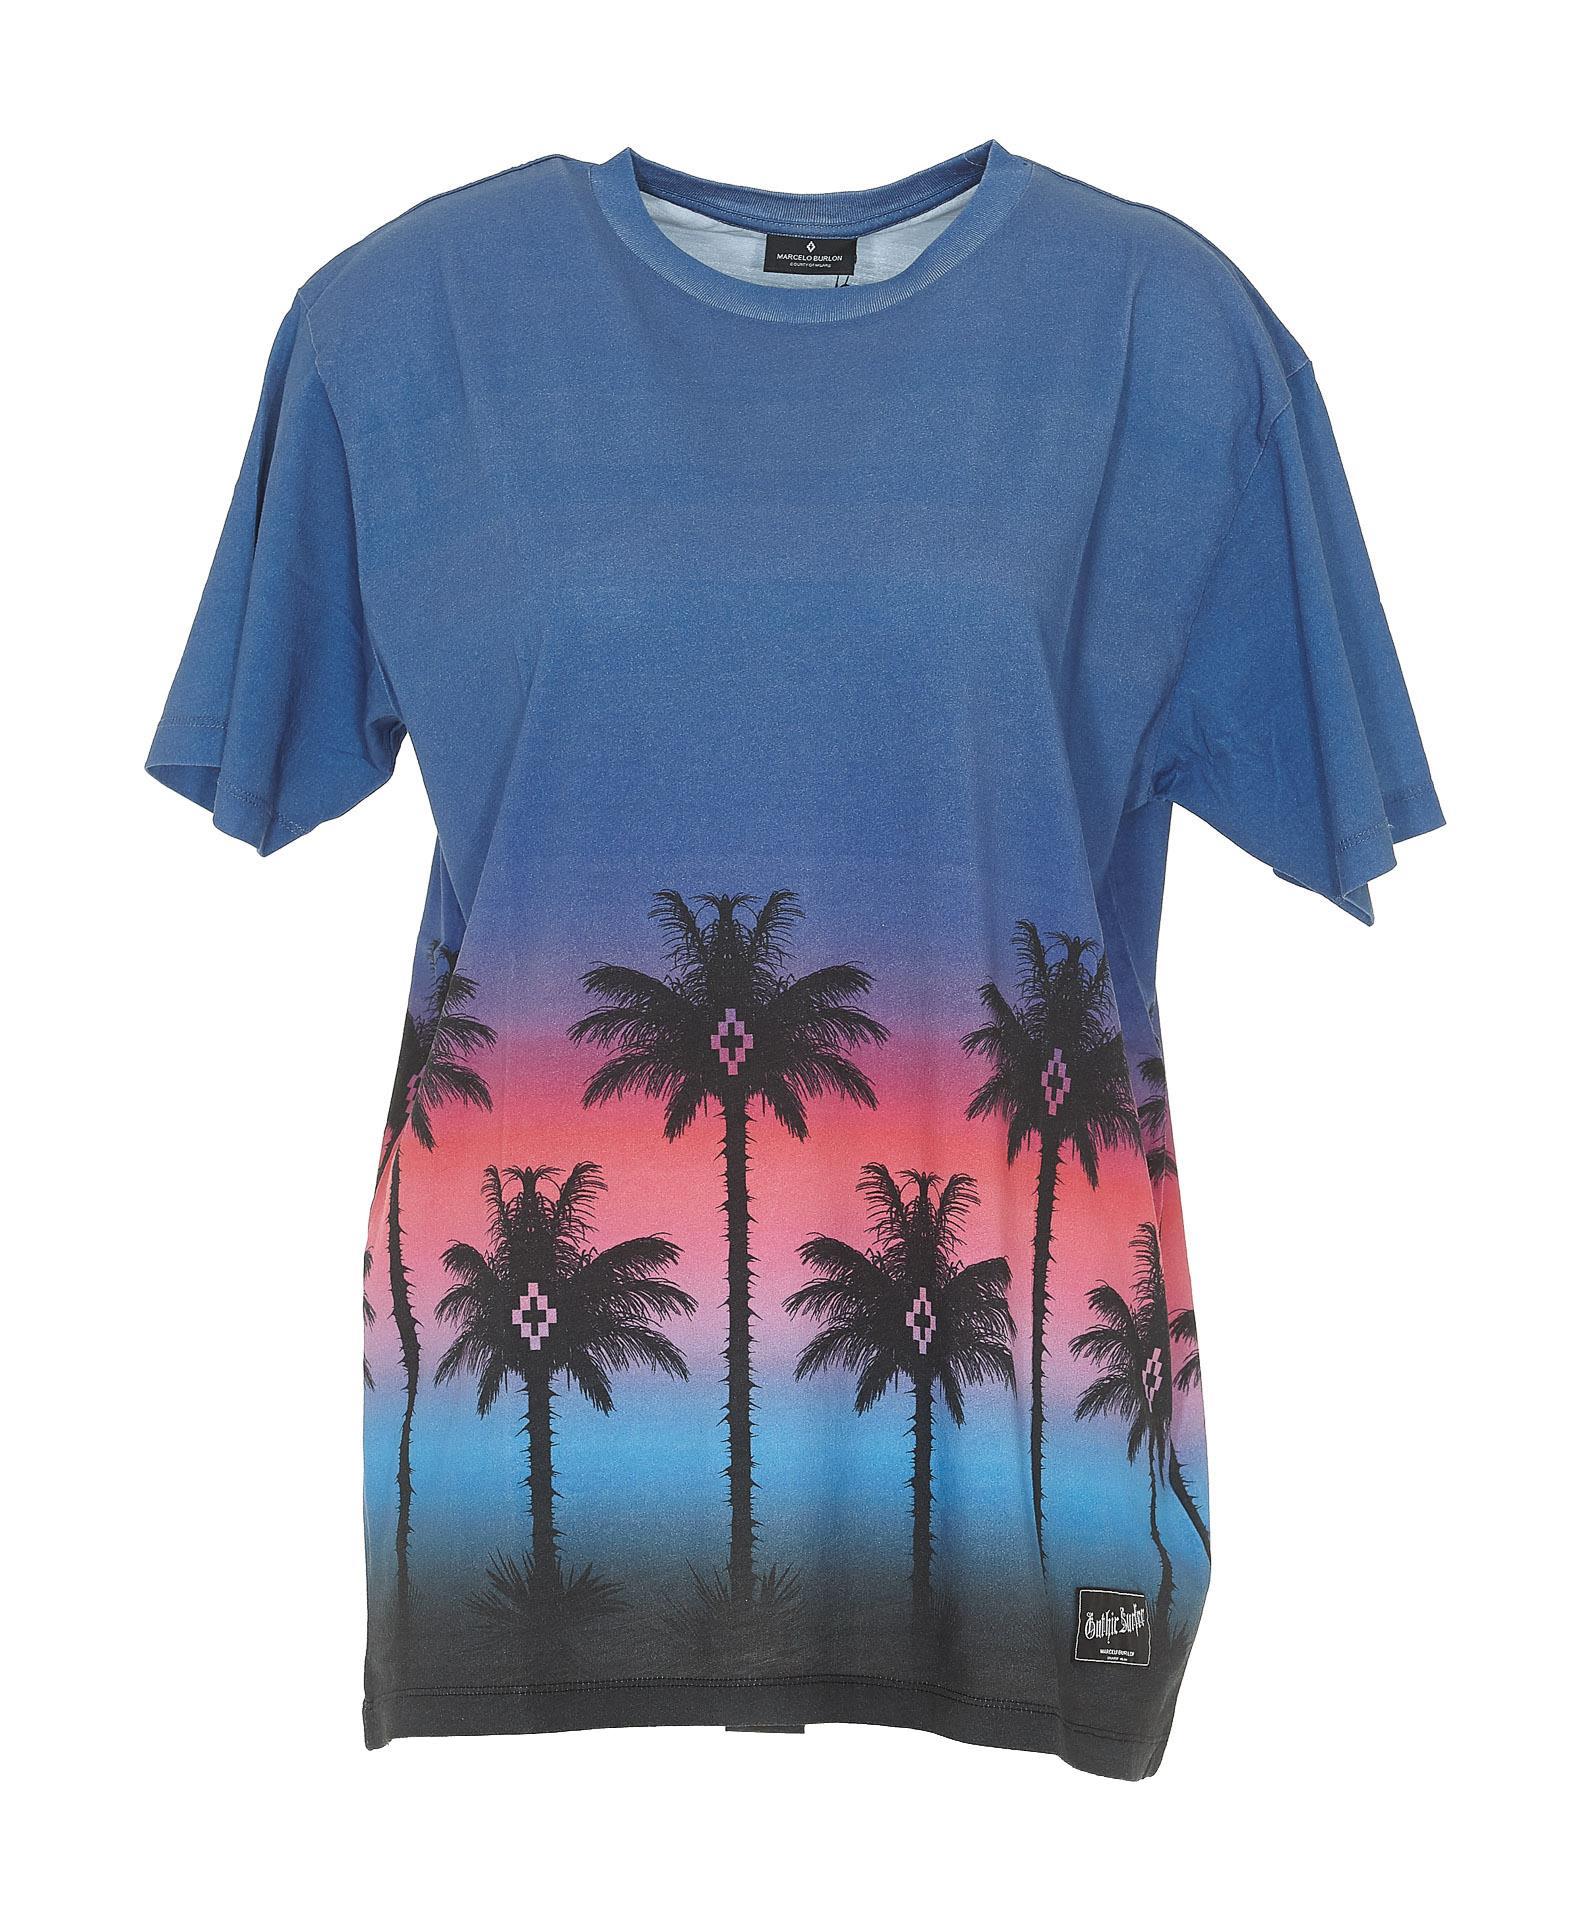 Best Sale Cheap Online Pink Palm t-shirt Marcelo Burlon Latest Q0Ug3N1DRn